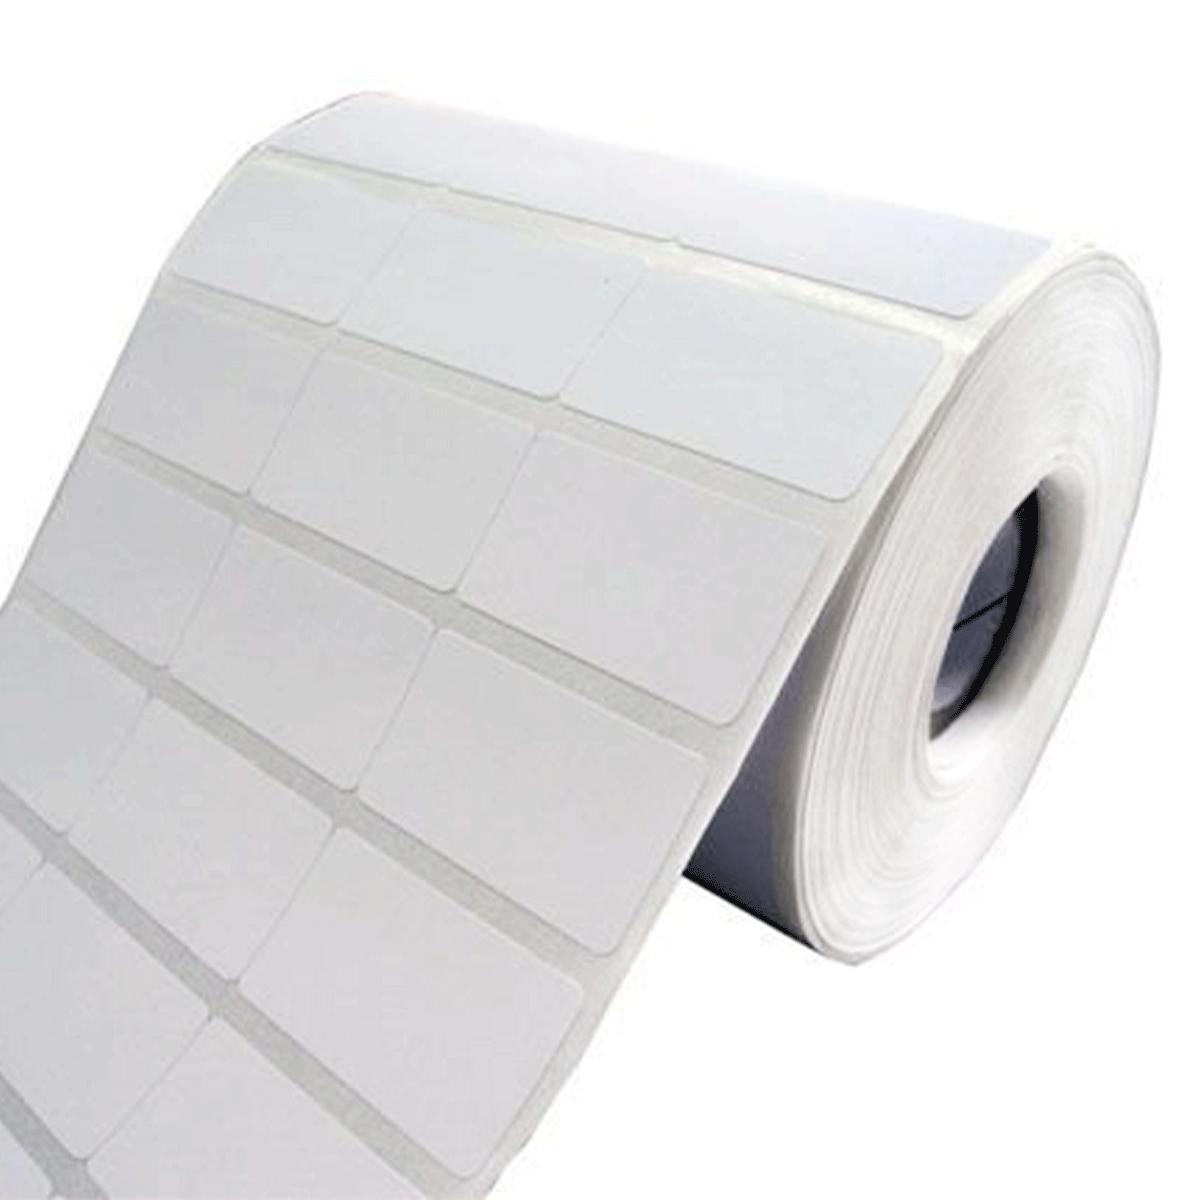 6 Rolos de Etiquetas Premium 34x23mm Couchê Branco Brilho